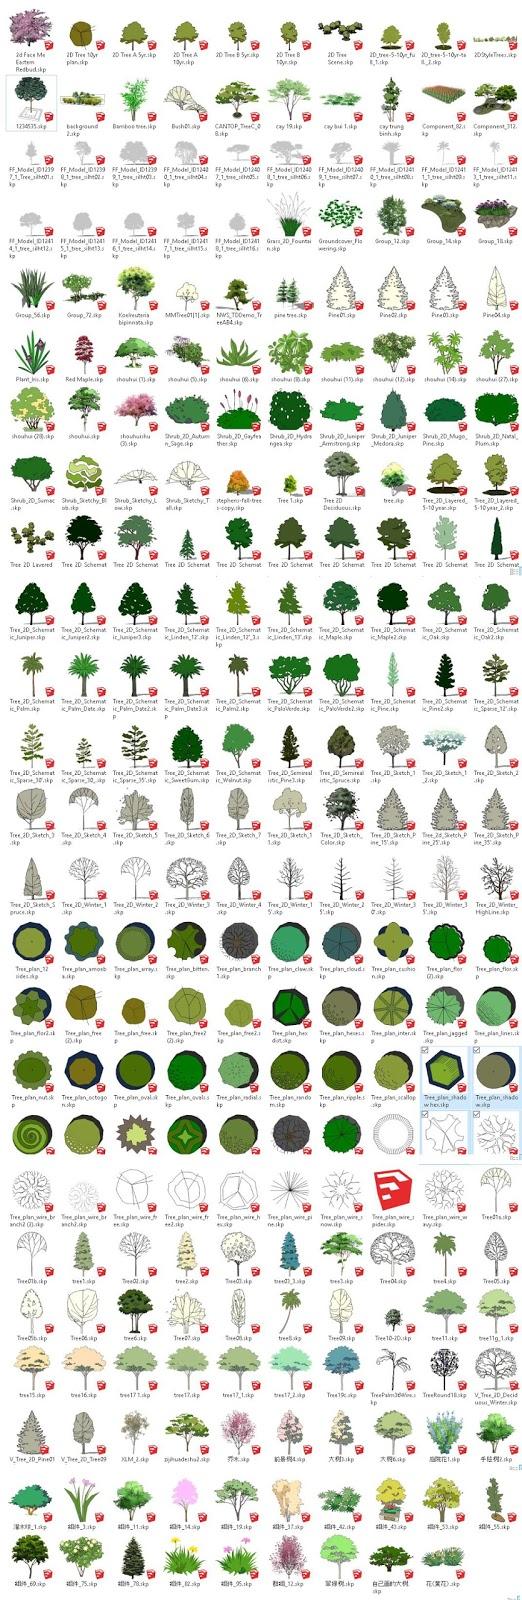 Sketchup Trees 2d